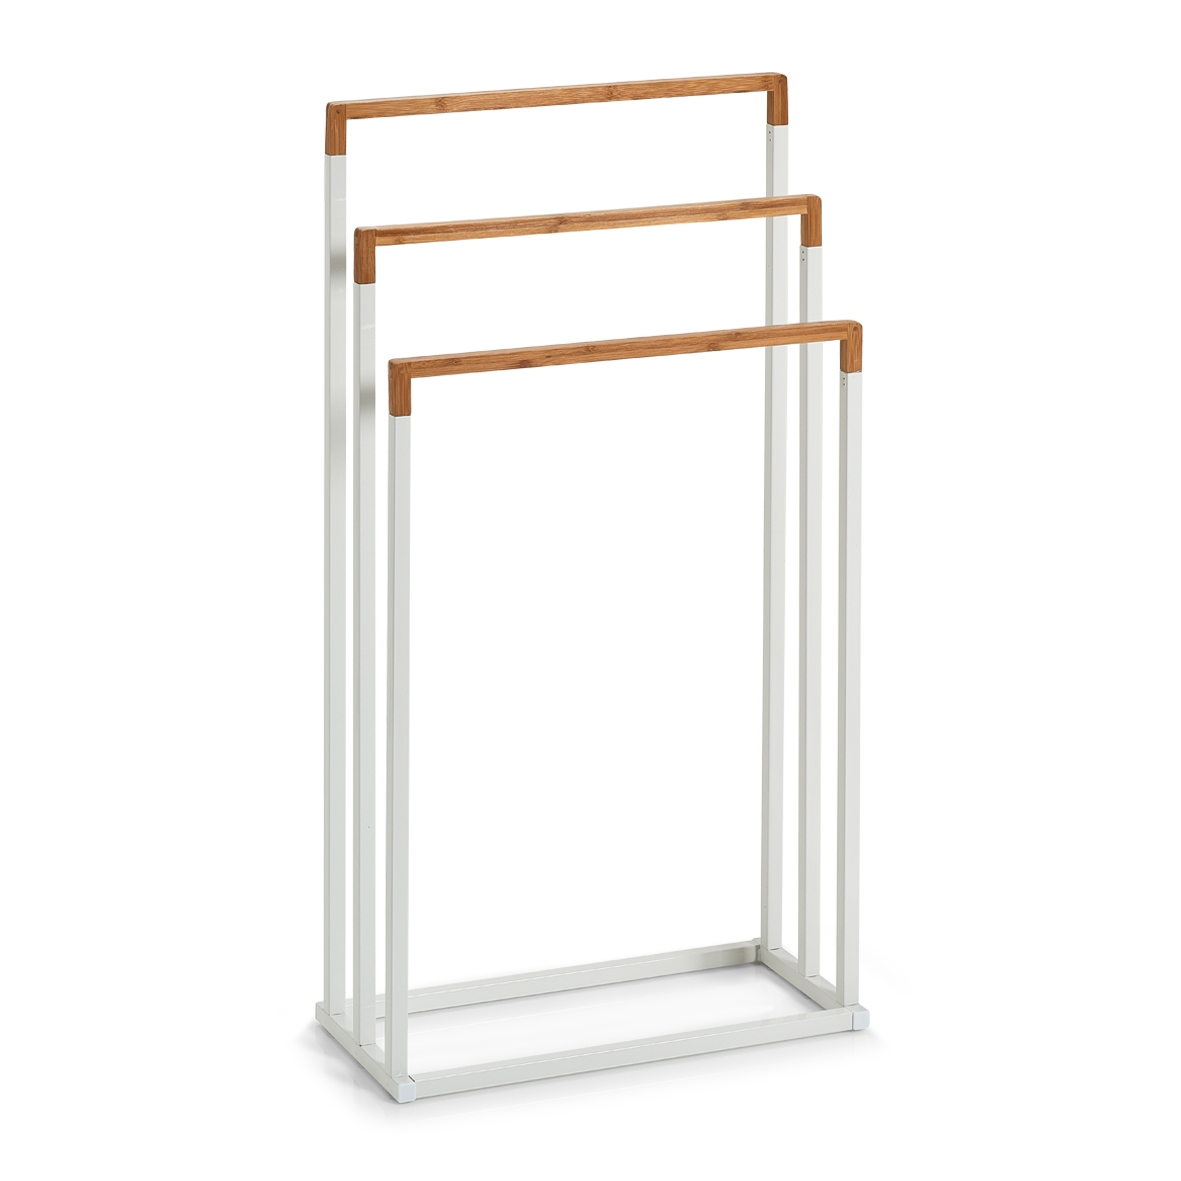 Suport pentru prosoape de baie, Bamboo Metal White, l45xA21,5xH84,5 cm poza